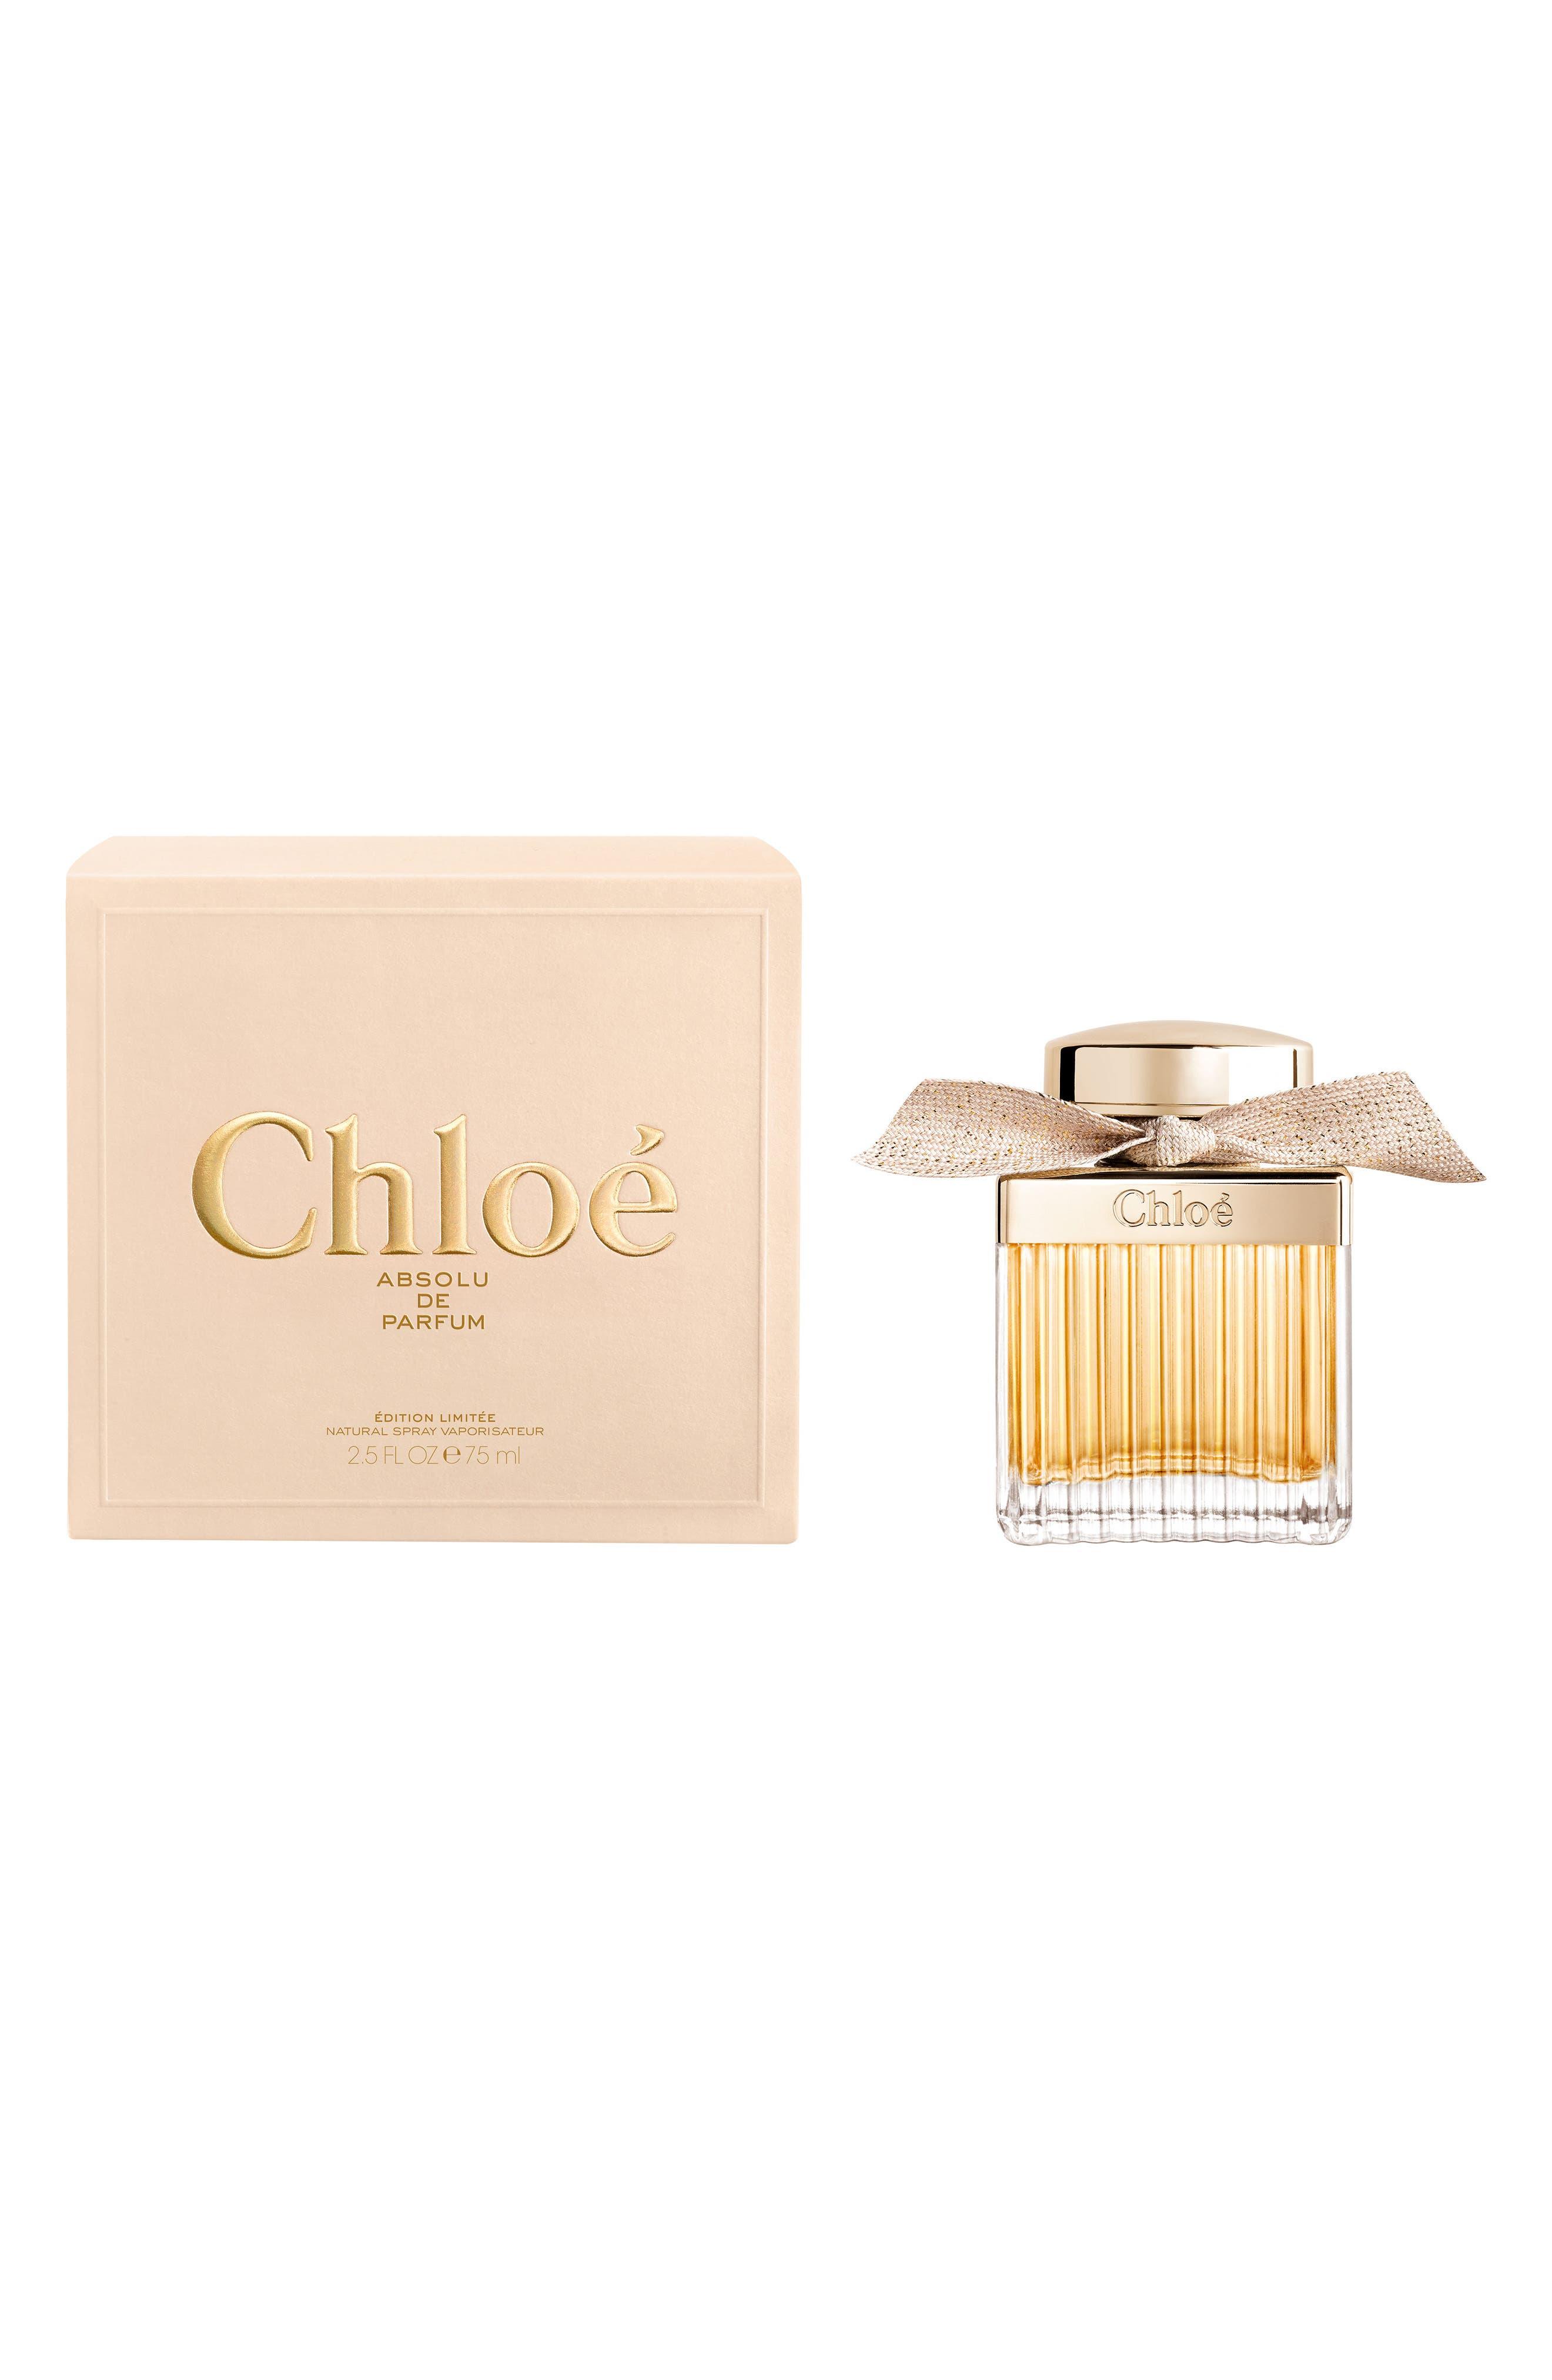 Alternate Image 1 Selected - Chloé Absolu de Parfum (Limited Edition)